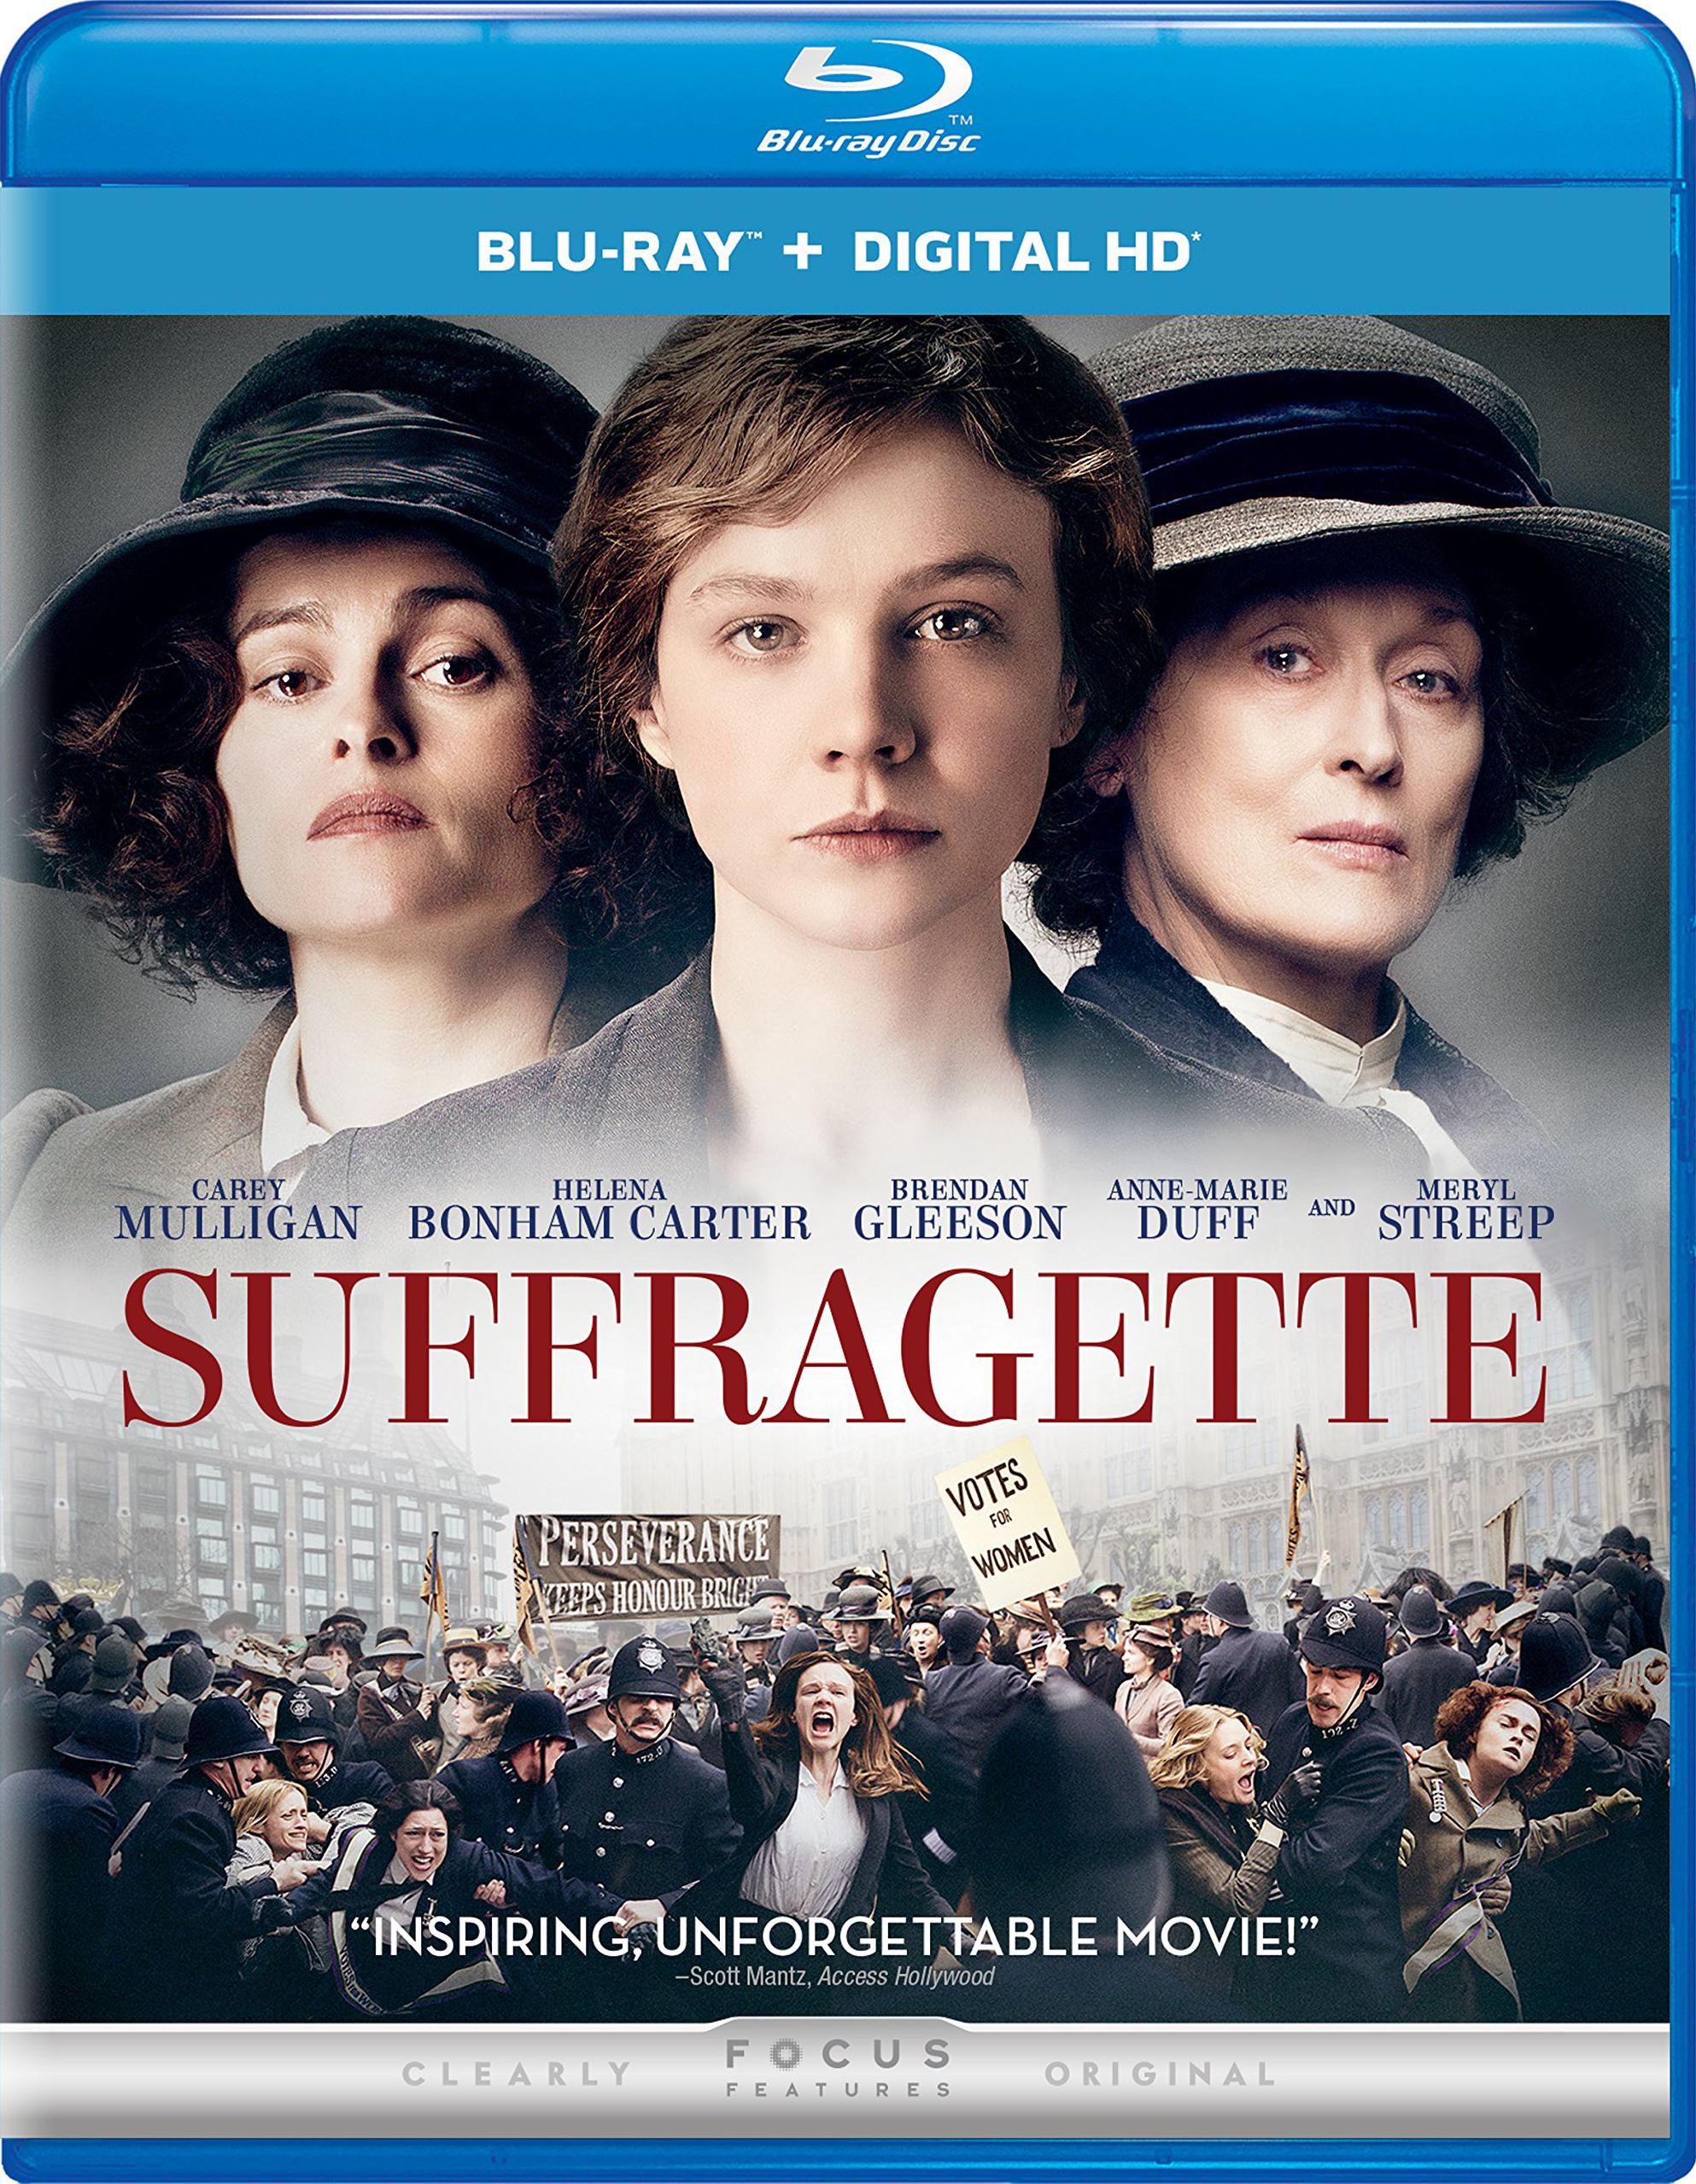 Suffragette (2015) Blu-ray